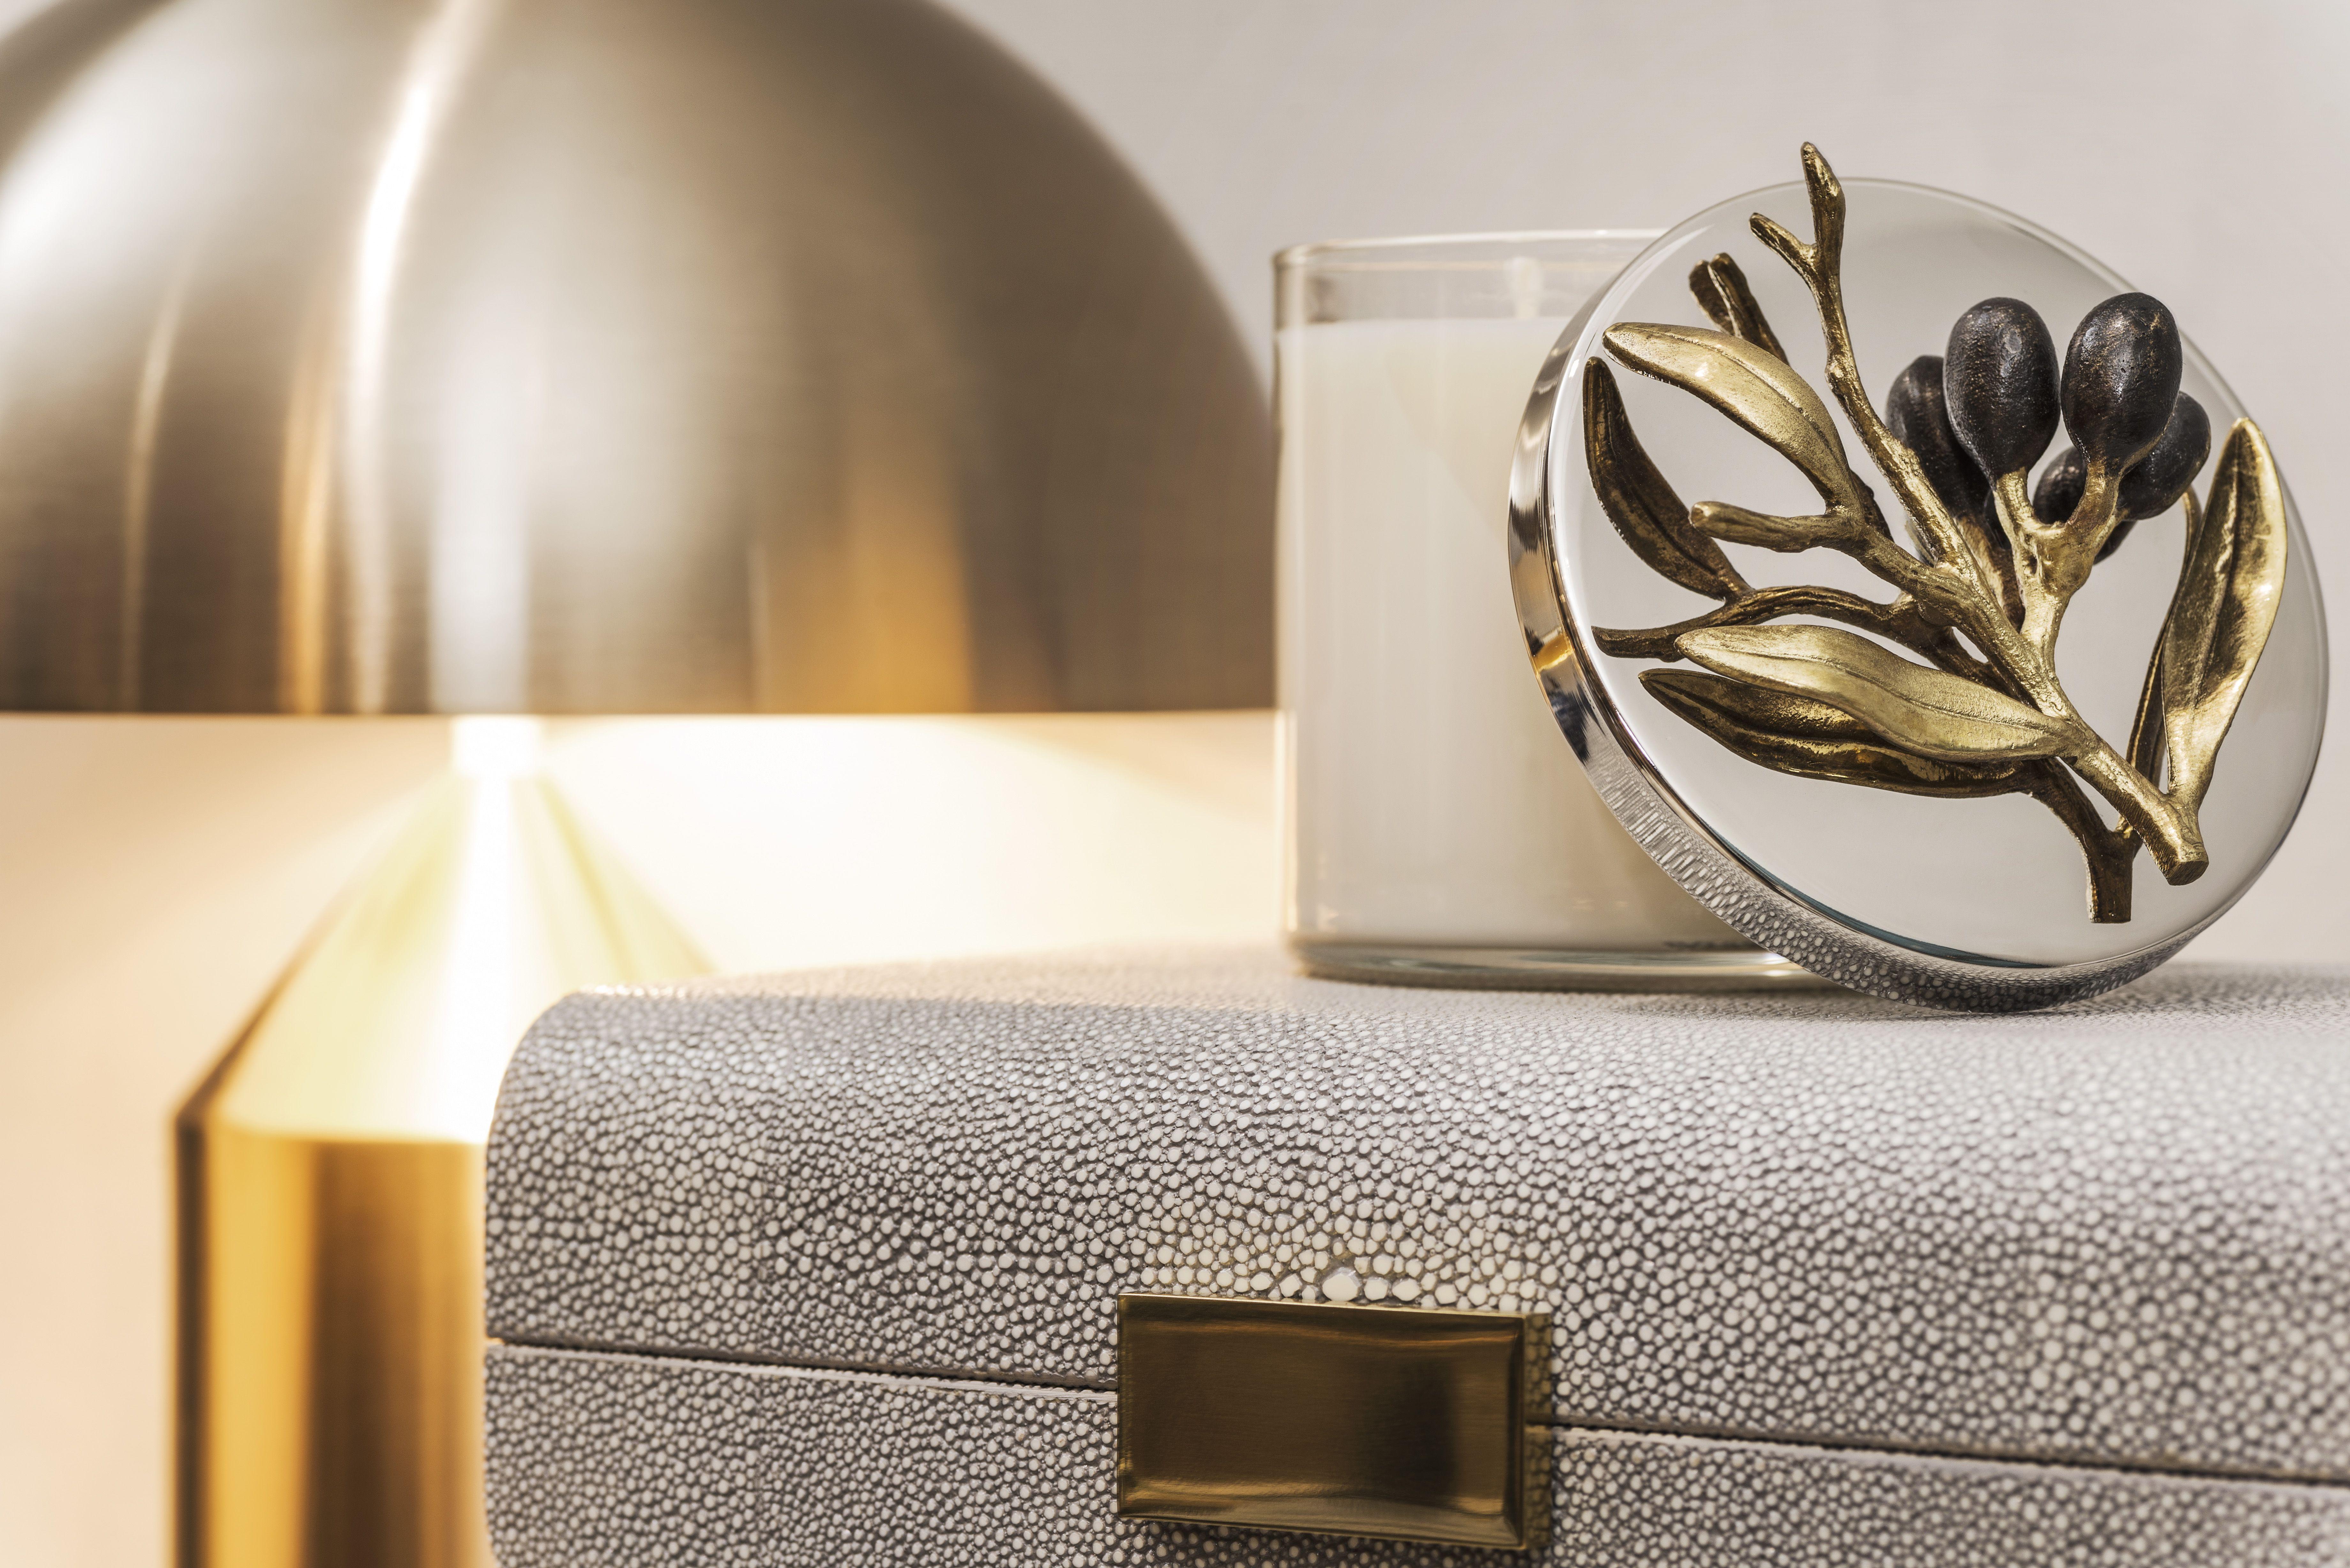 The Sofa & Chair pany Interior Lifestyle